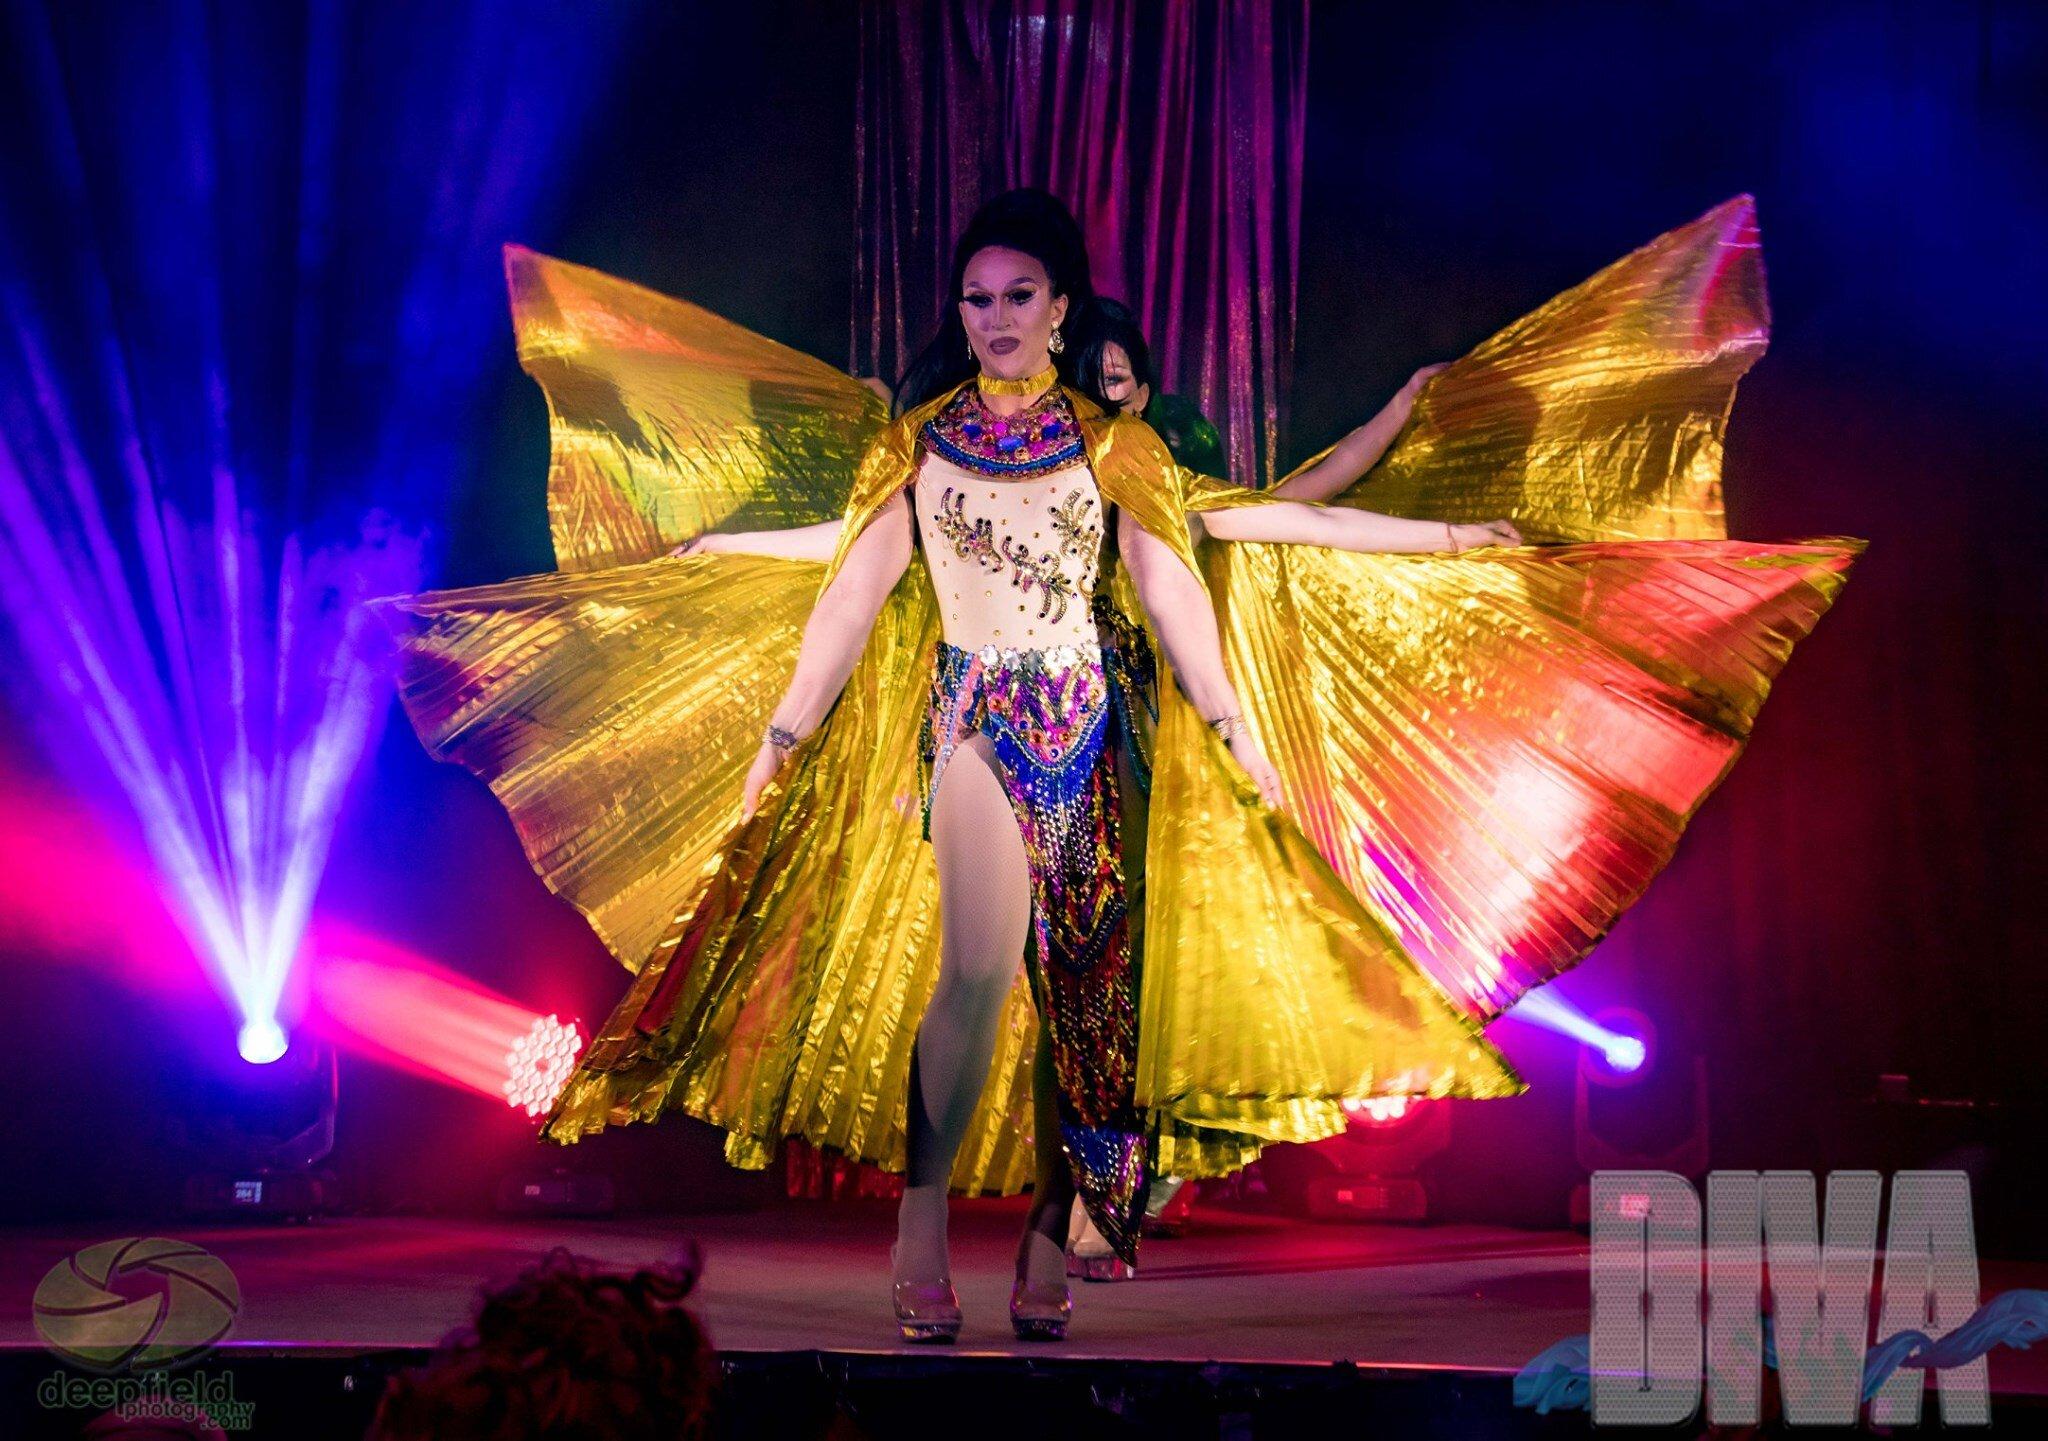 slay-2-stay-danni-issues-show-entertainment-diva-awards-sydney-drag-queen-royalty-best-hire-drag-race-australia.jpg